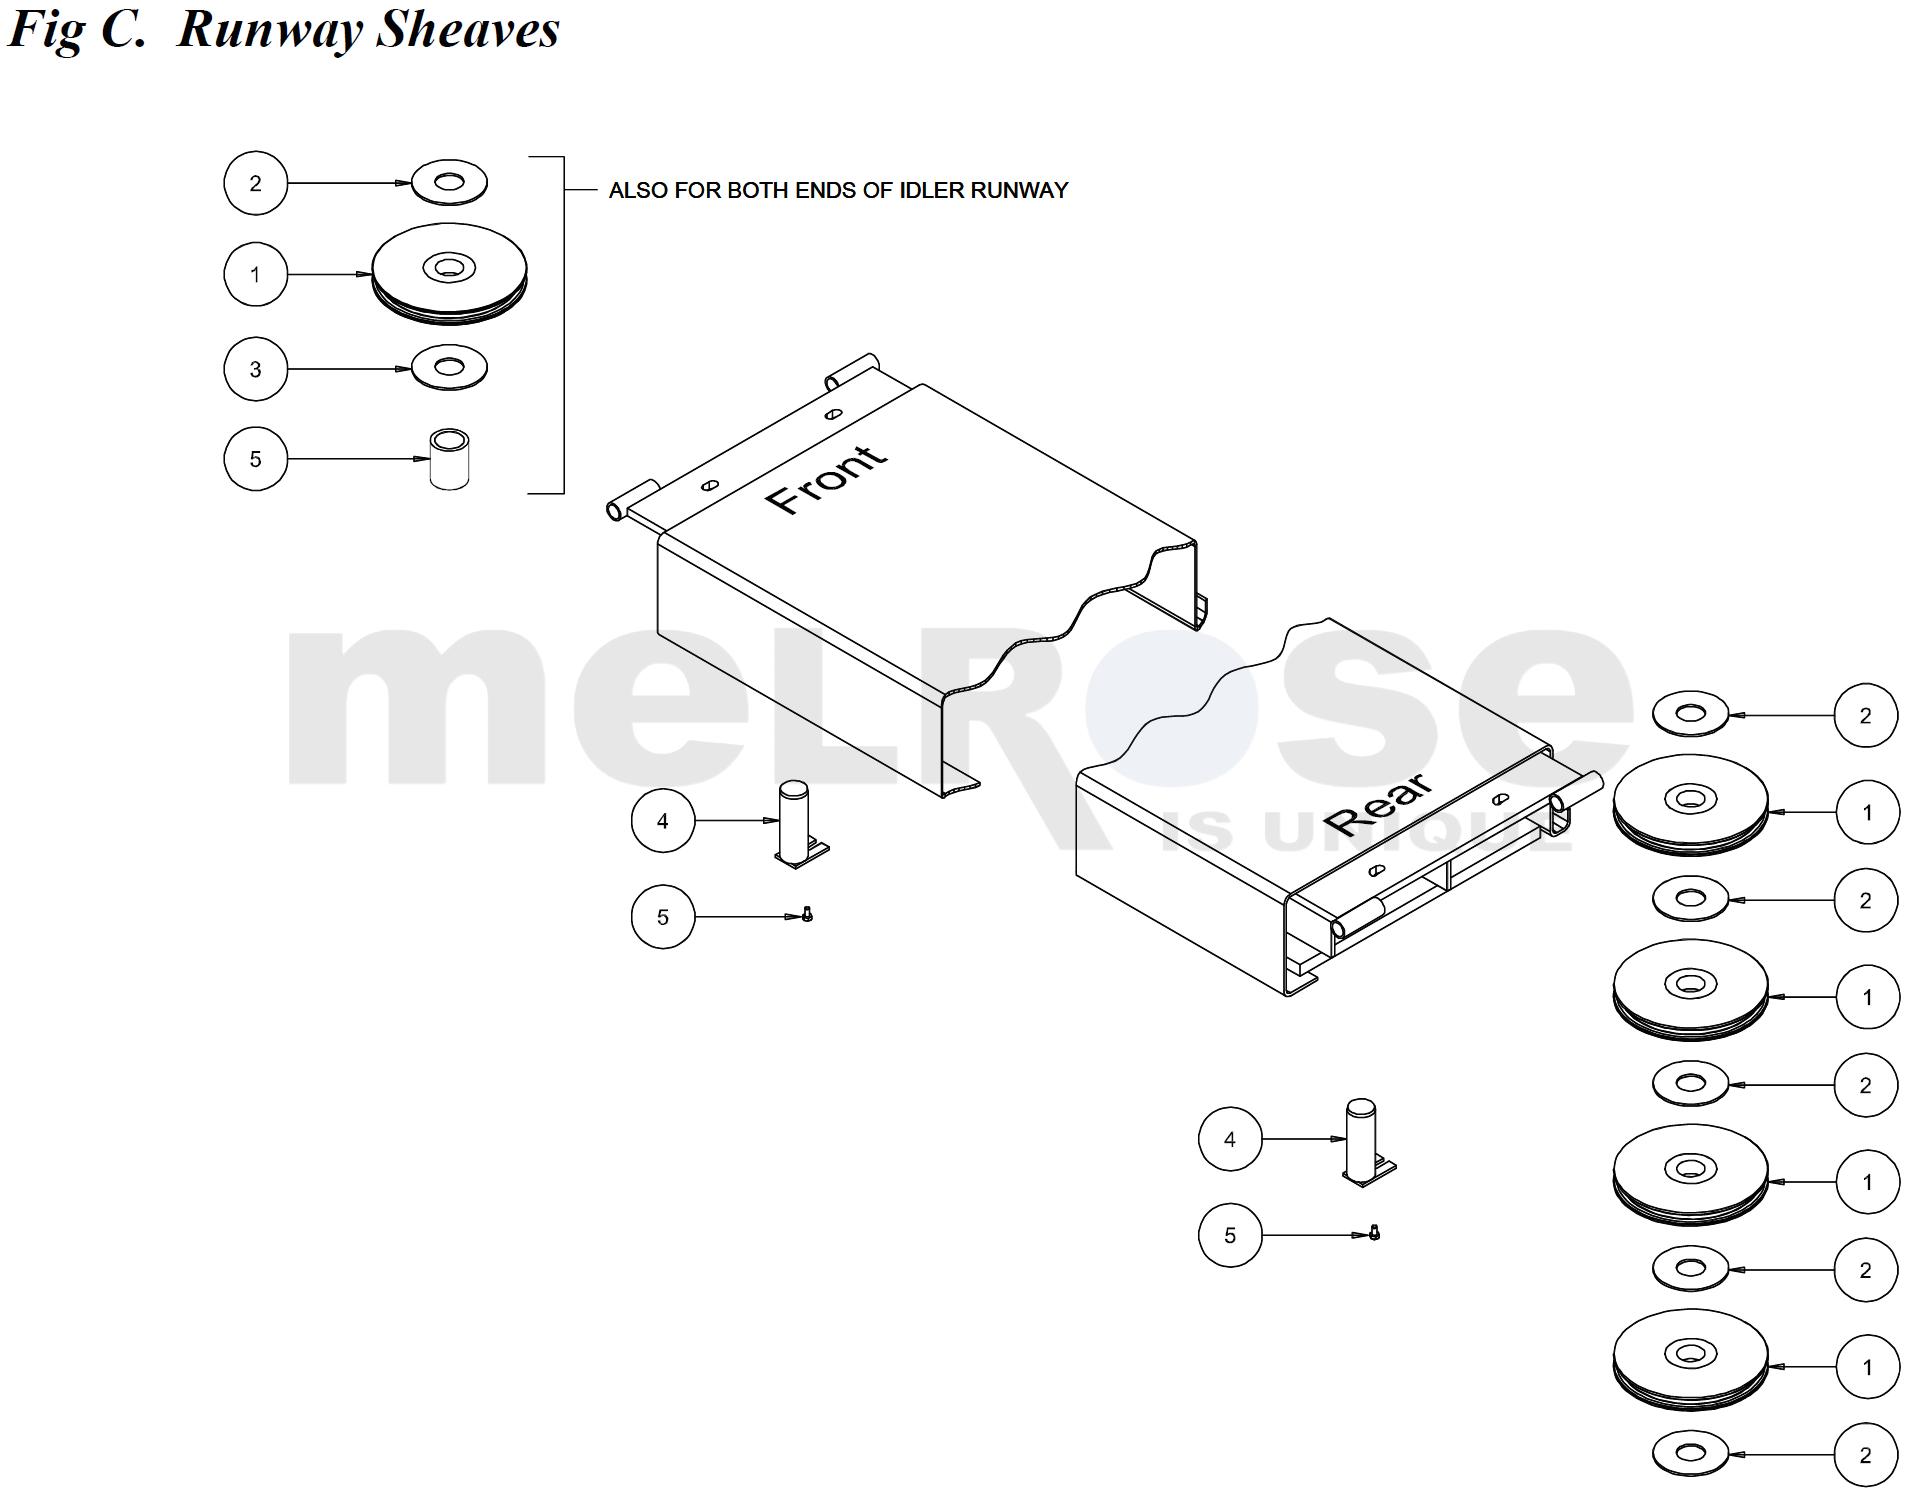 40000-open-front-runway-sheaves-diagram-marked.jpg